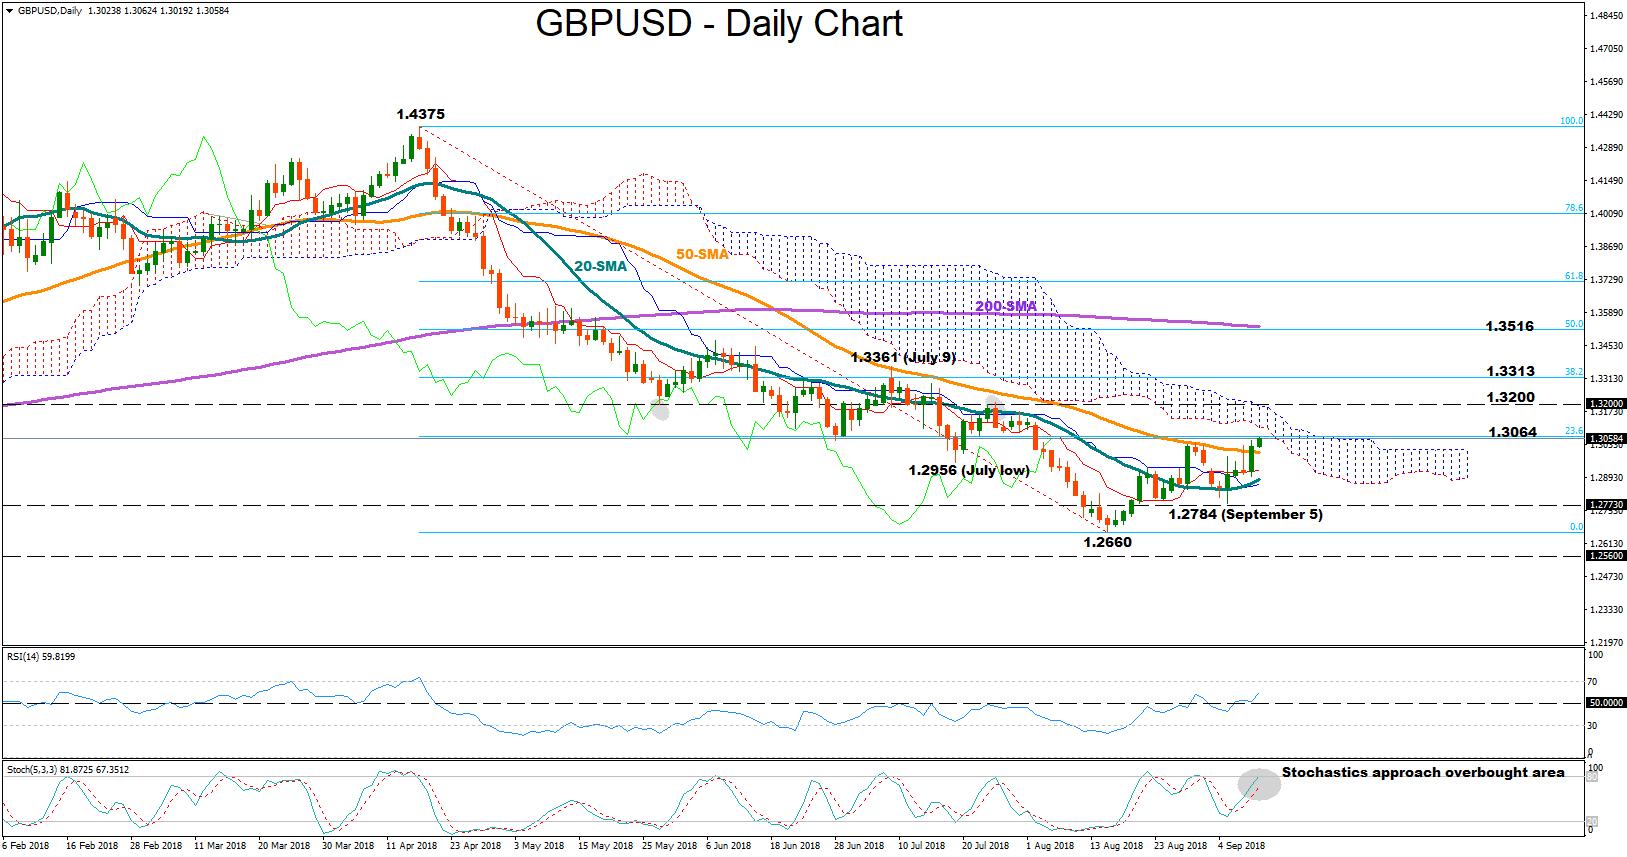 GBP/USD 11Sept18 | EconAlerts